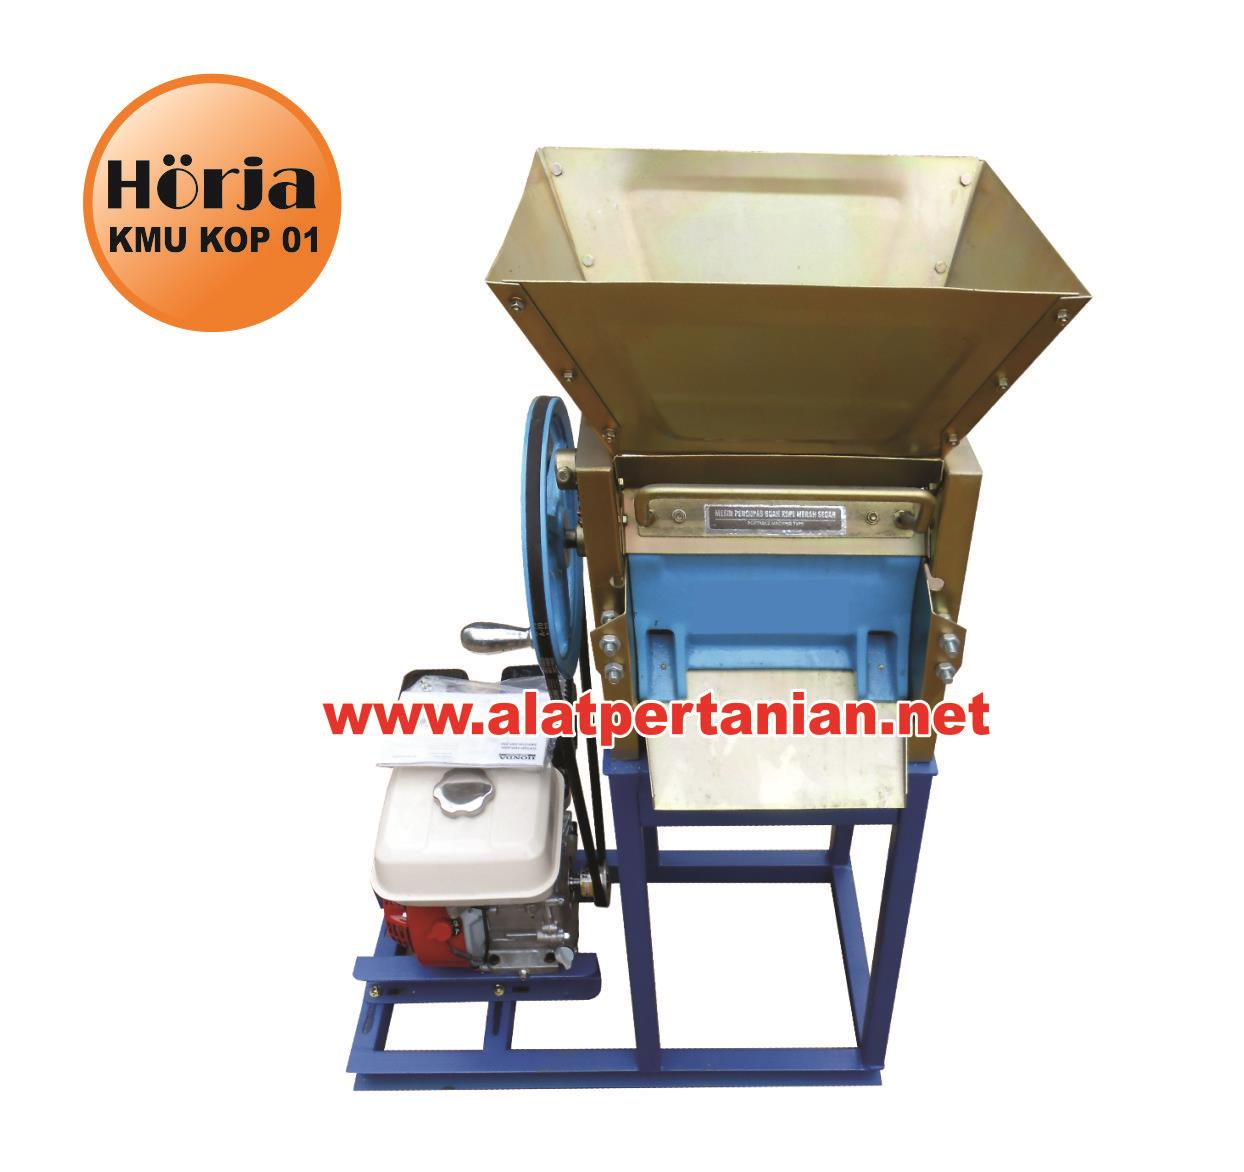 Sell Engine Test Report Coffee Pulper From Indonesia By Toko Bor Biopori Spiral Rancabungur Sukses Mandiricheap Price